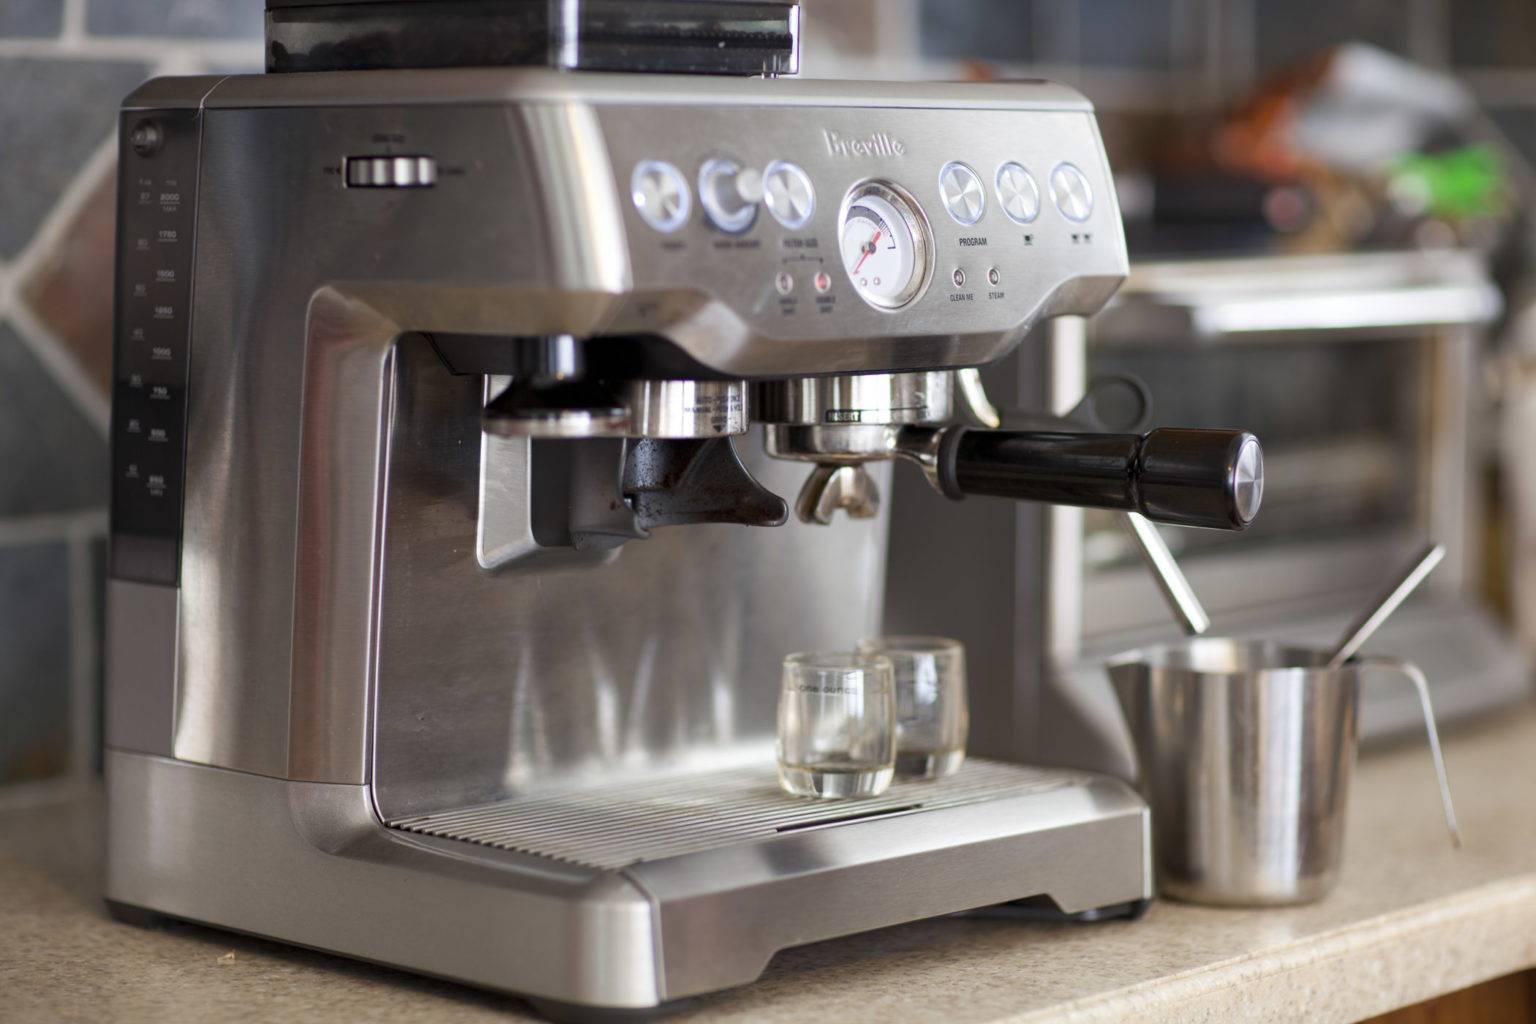 Чистка кофеварки от накипи в домашних условиях